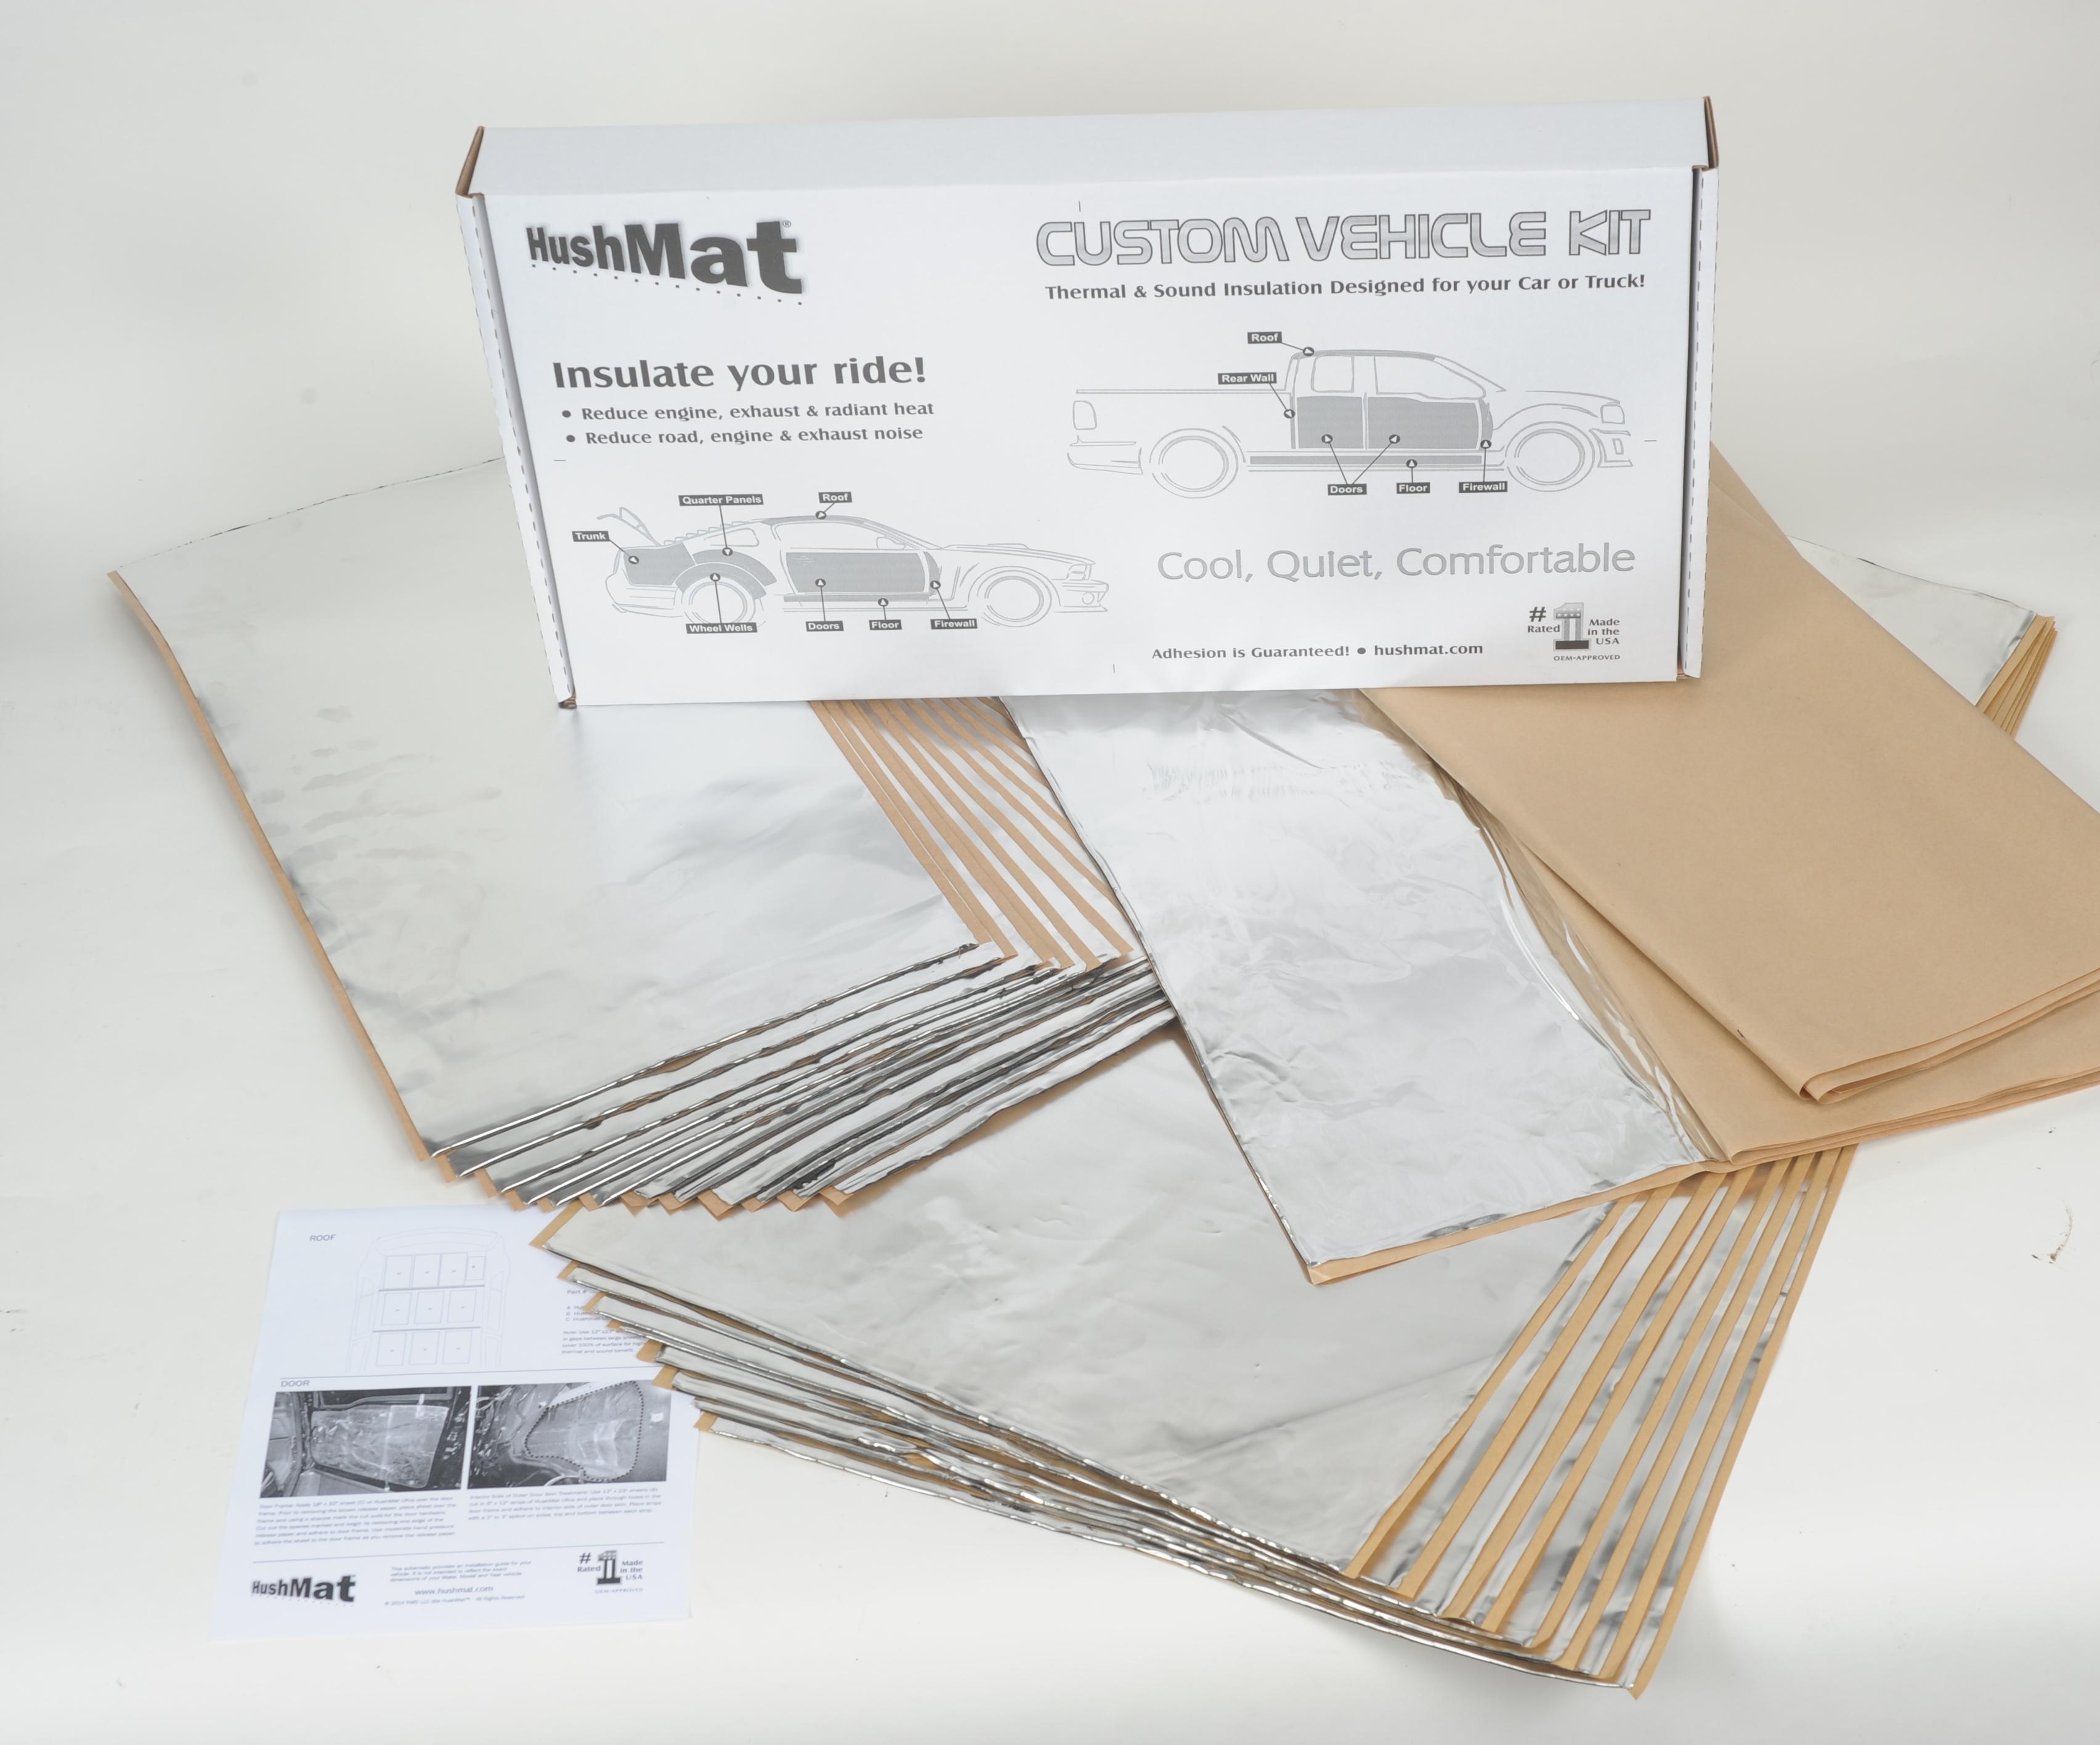 Hushmat 58010 Complete Vehicle Custom Insulation Kit